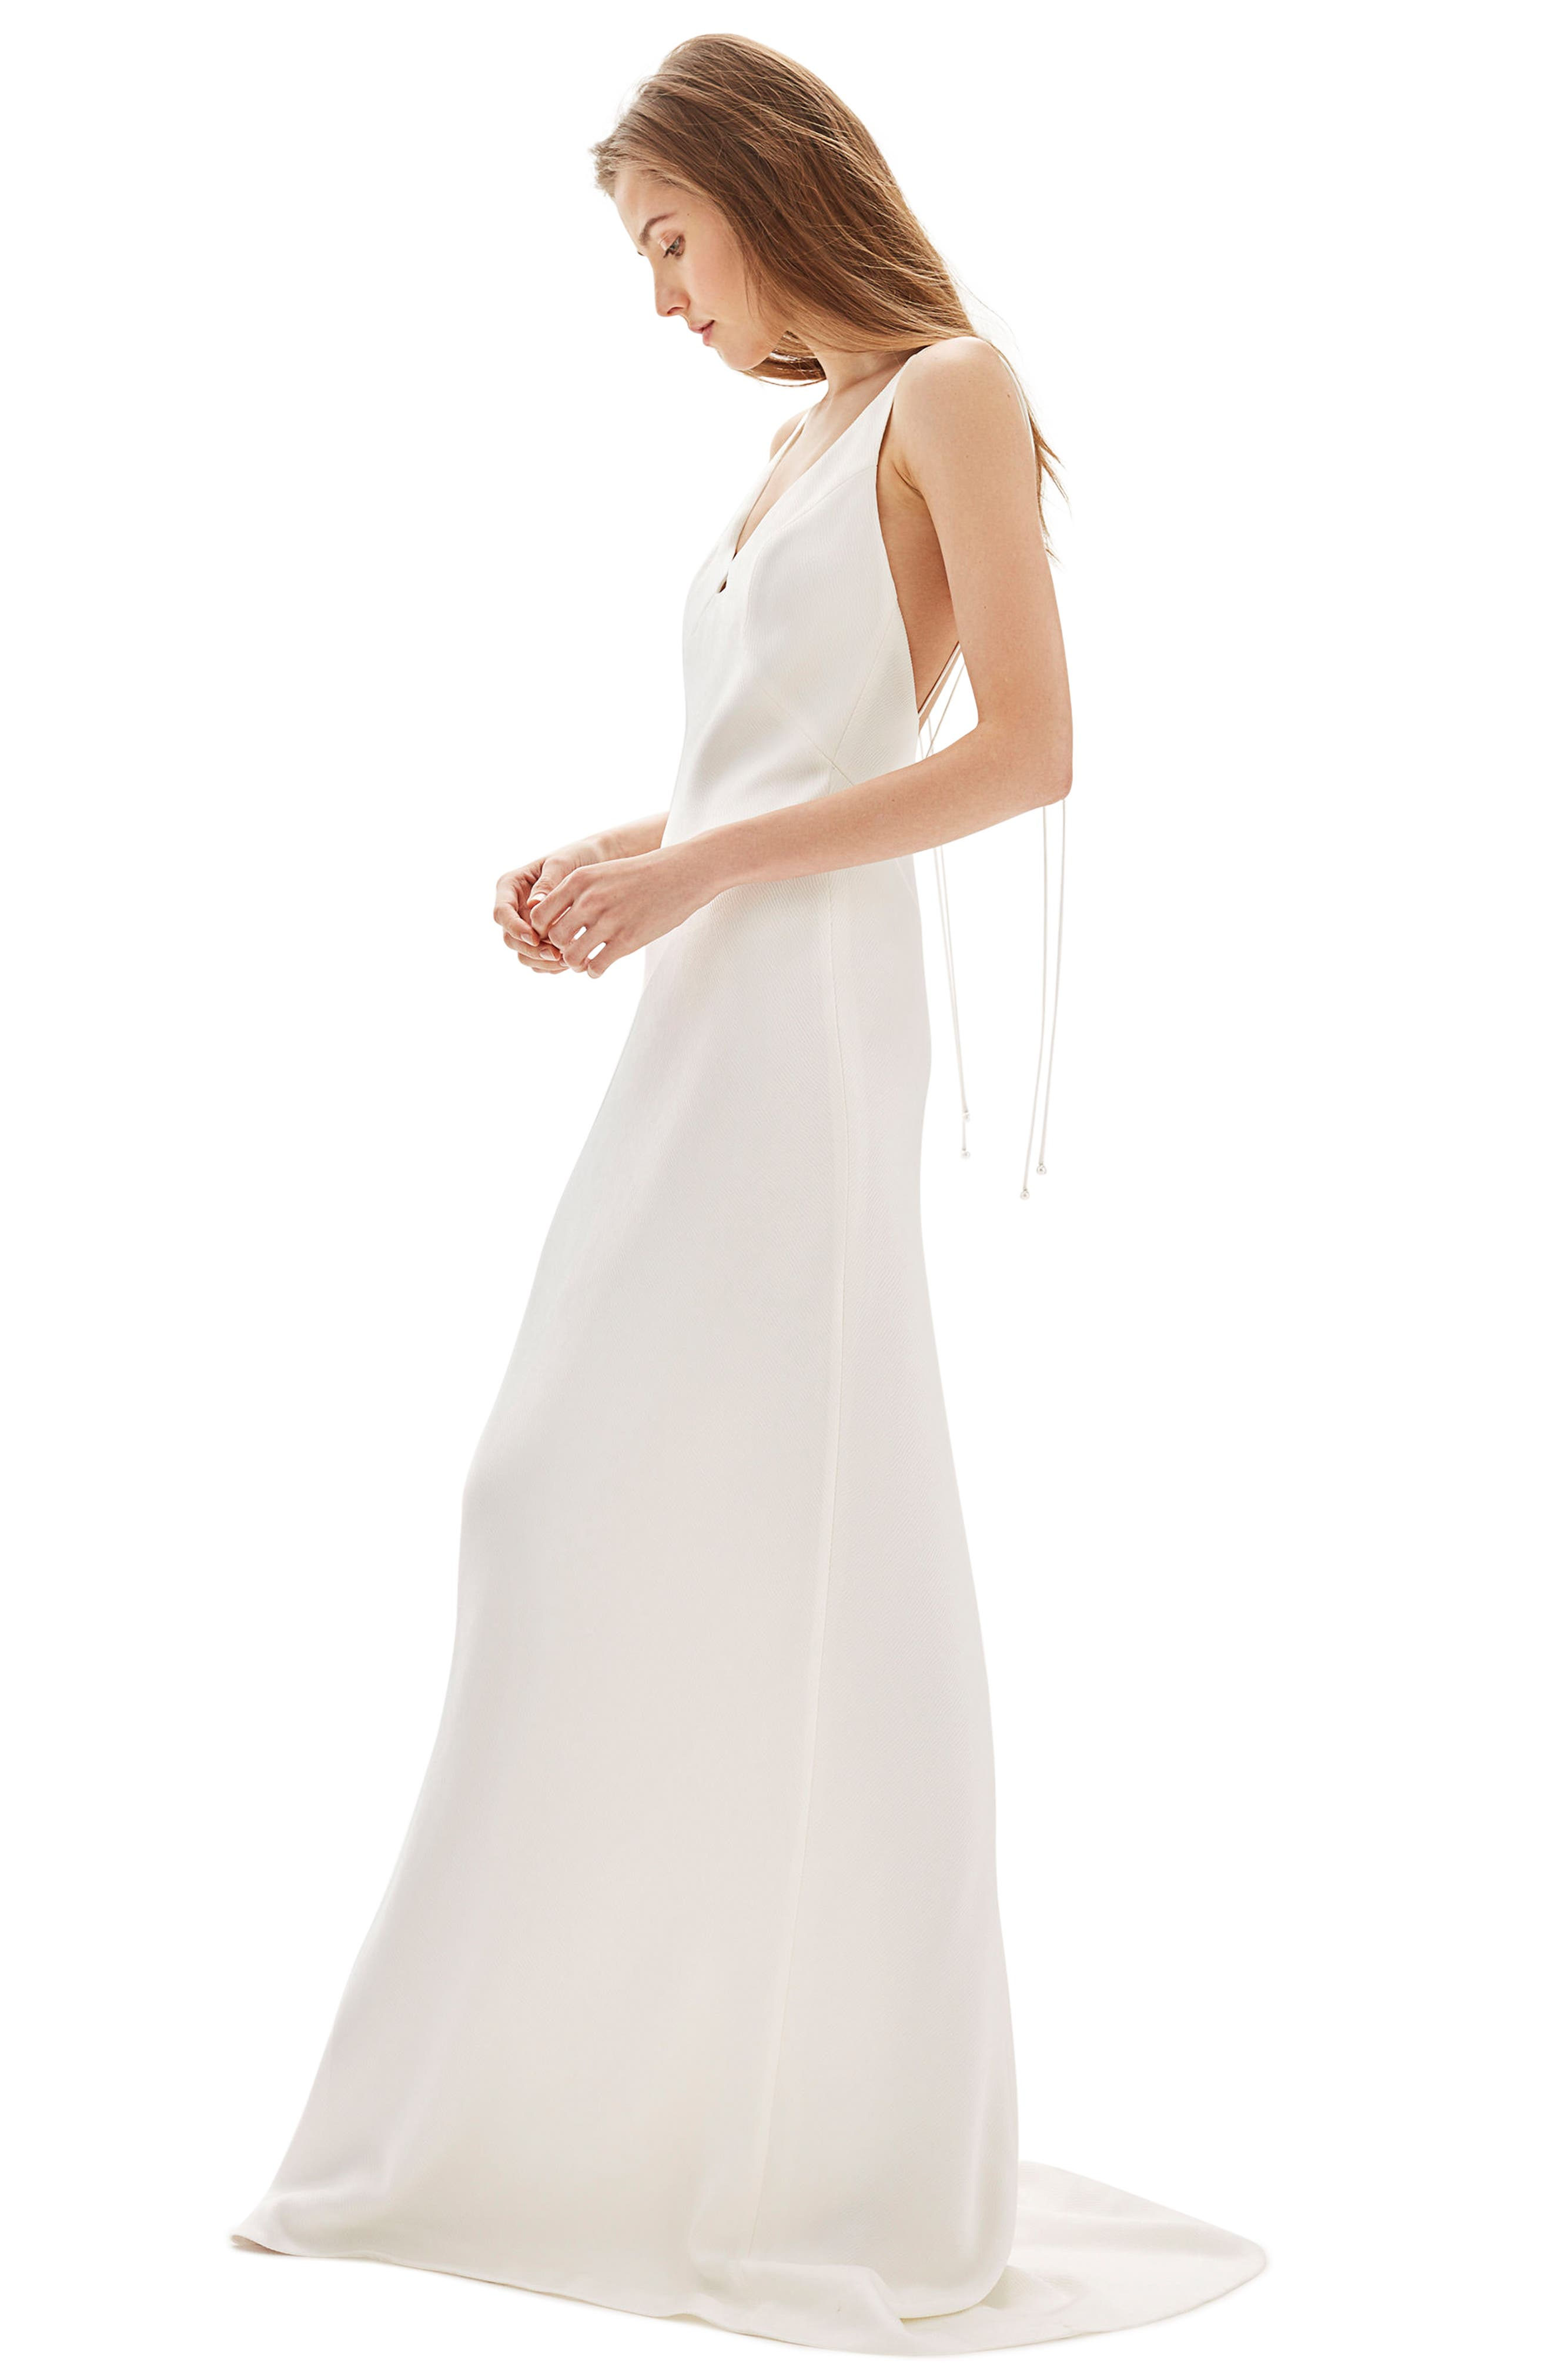 Bride V-Neck Satin Sheath Gown,                             Alternate thumbnail 3, color,                             900